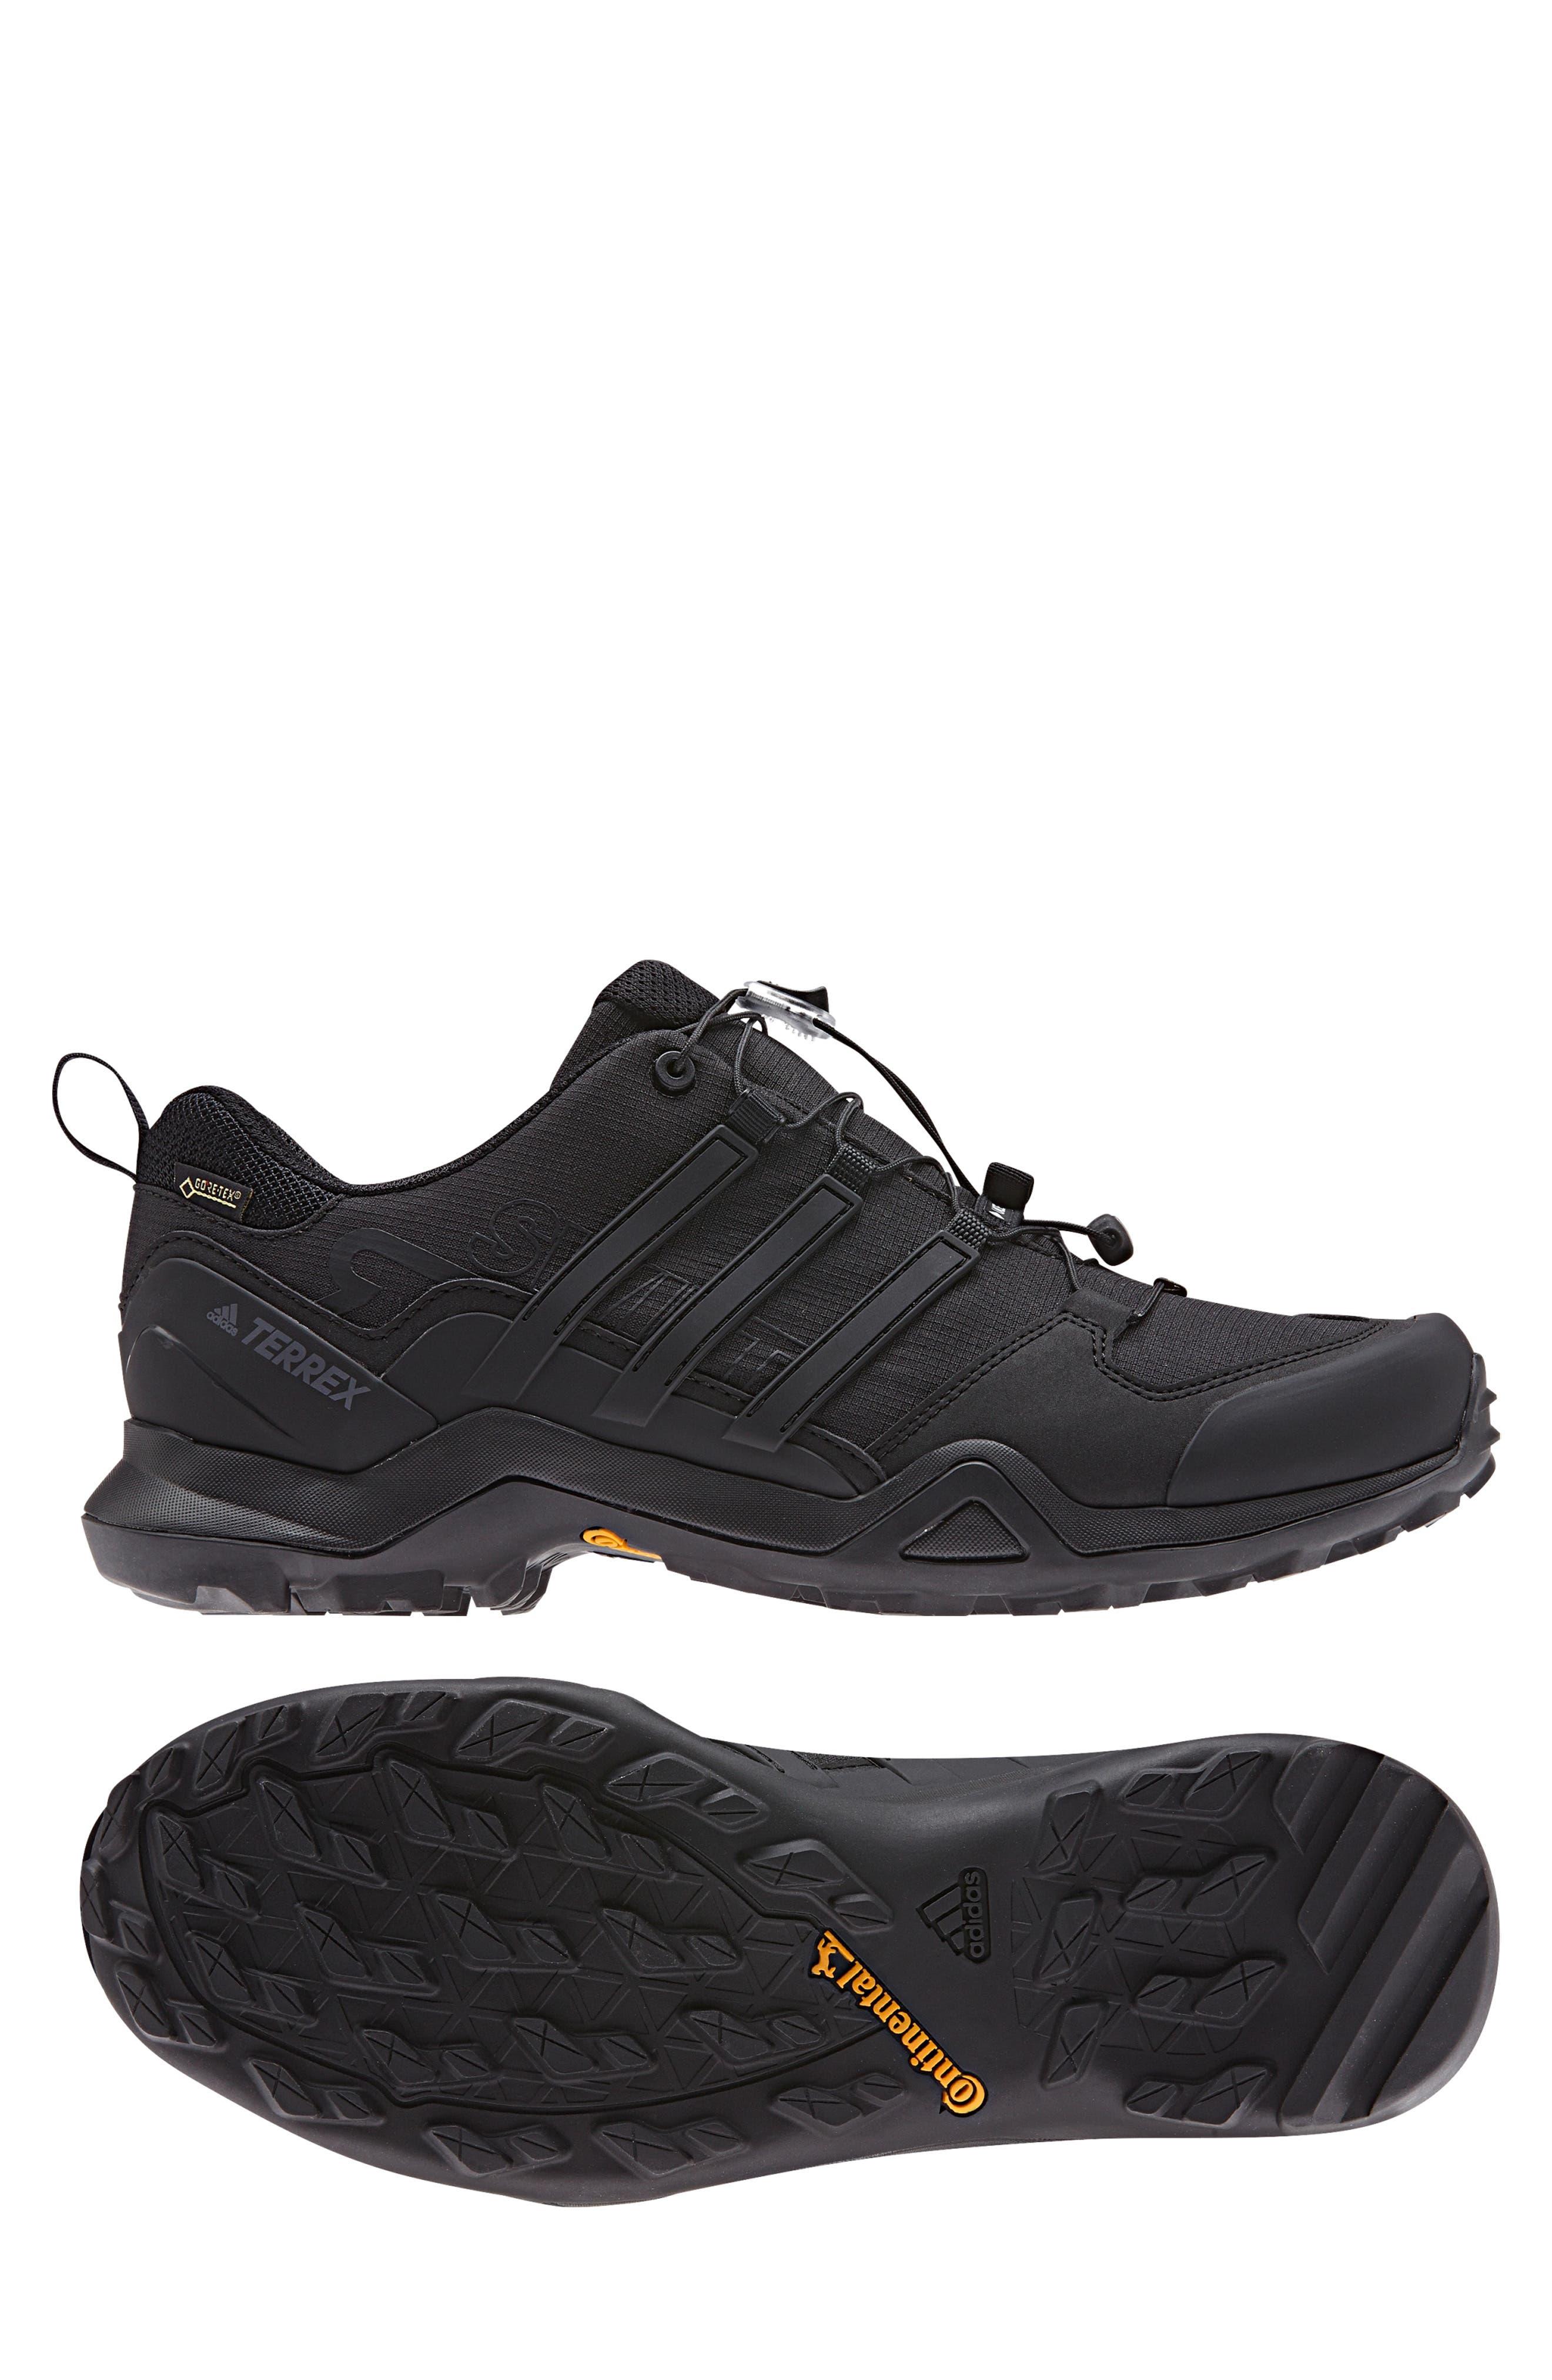 ADIDAS,                             Terrex Swift R2 GTX Gore-Tex<sup>®</sup> Waterproof Hiking Shoe,                             Alternate thumbnail 10, color,                             BLACK/ BLACK/ BLACK